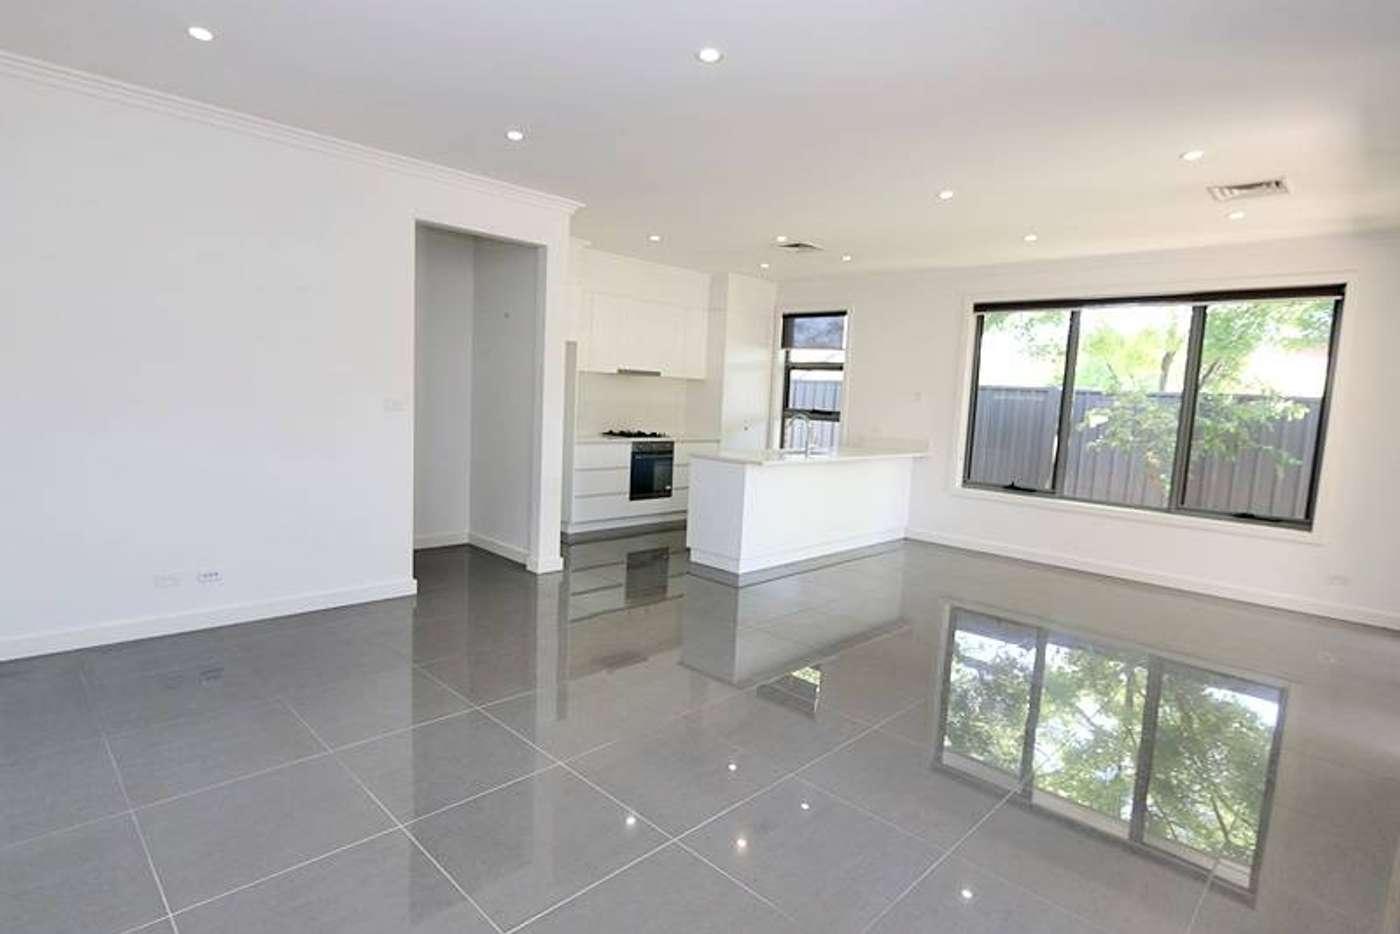 Sixth view of Homely unit listing, 2/149 Gurwood Street, Wagga Wagga NSW 2650